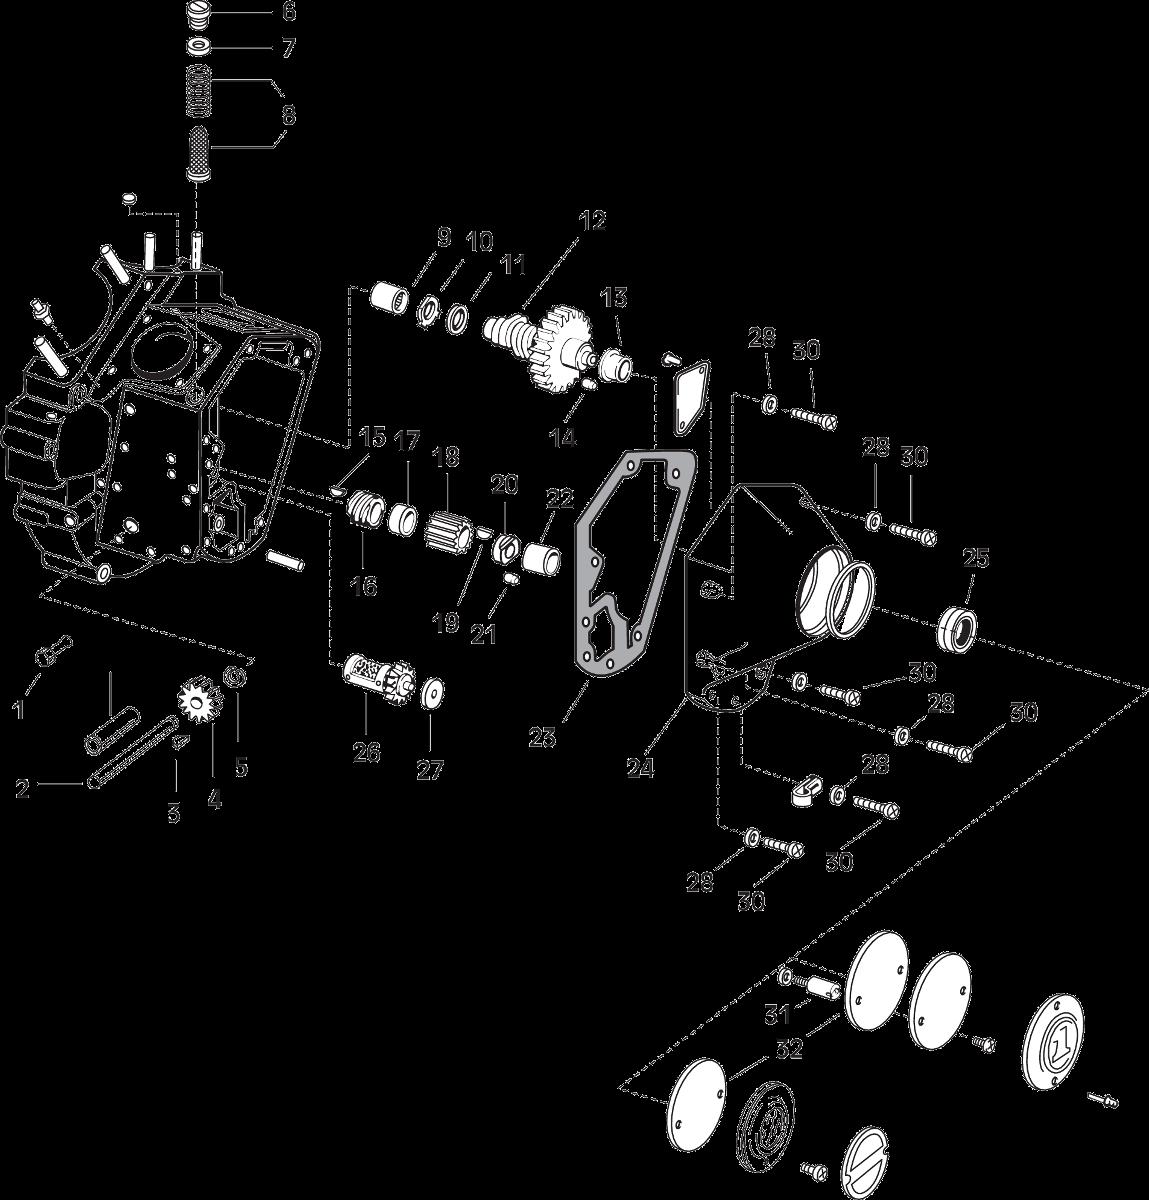 Gemütlich Ironhead Chopper Wiring Diagram Ideen - Schaltplan Serie ...